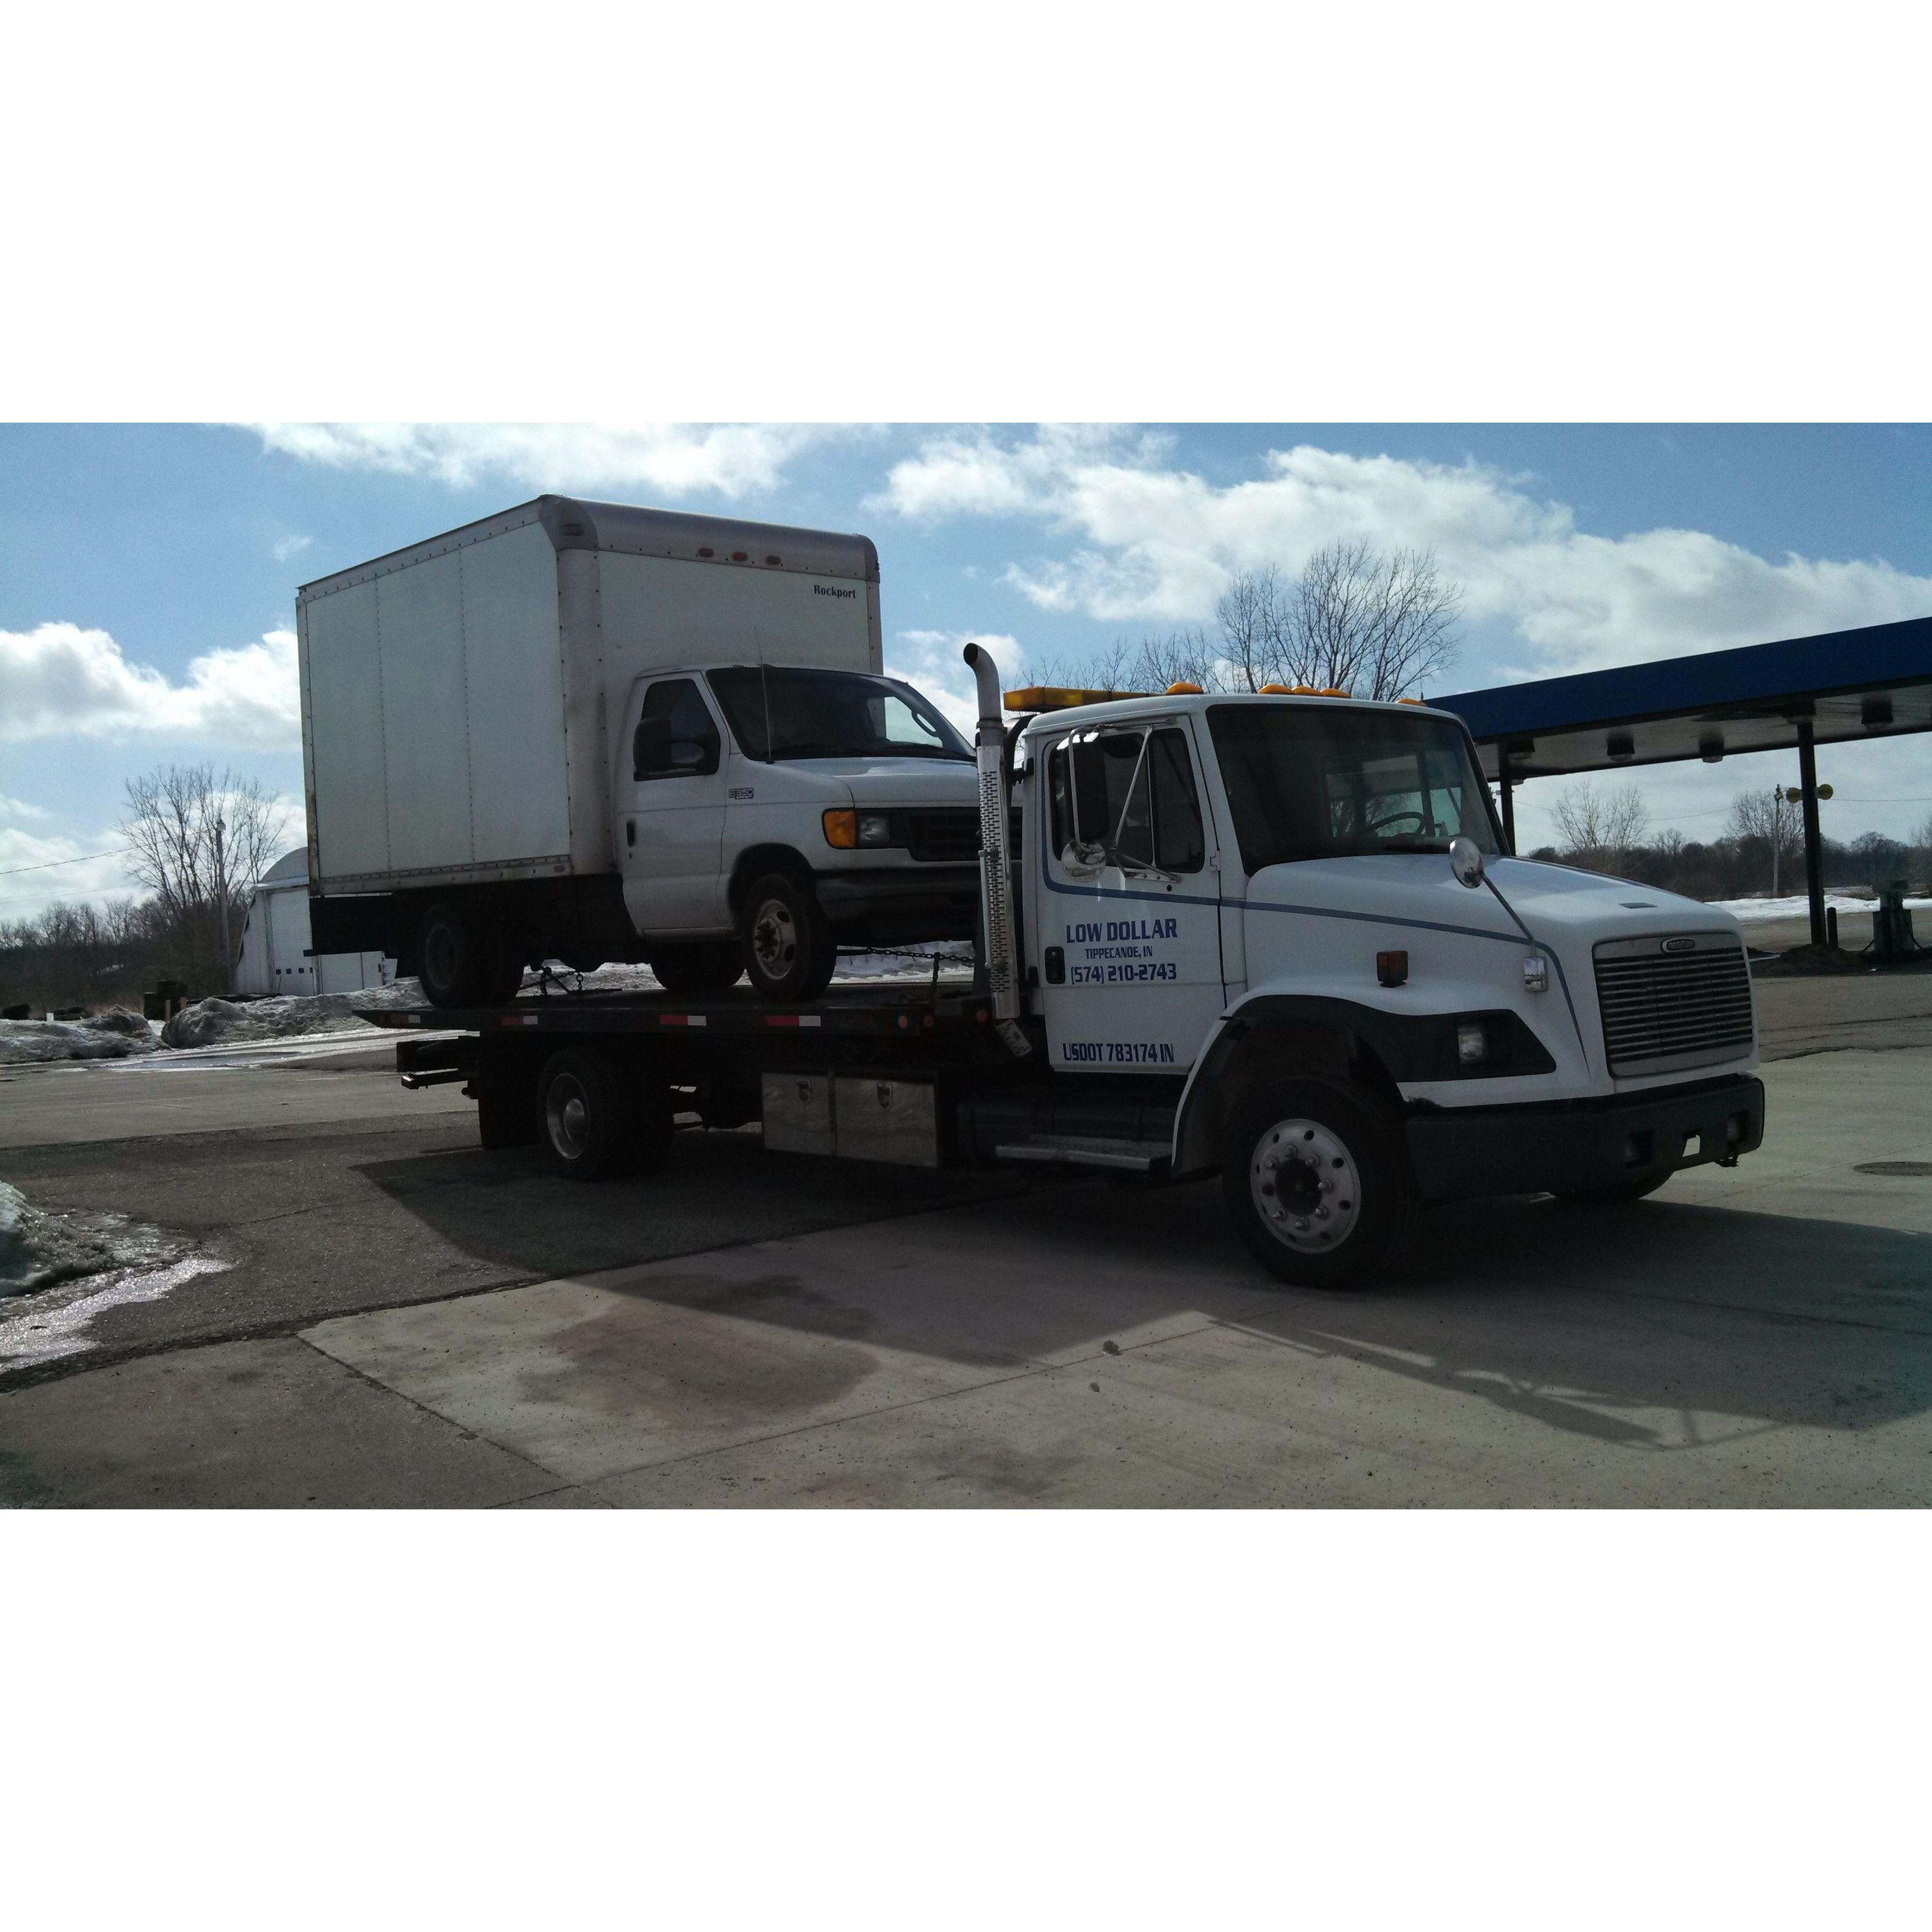 Low Dollar Companies L.L.C. / Towing Road Service